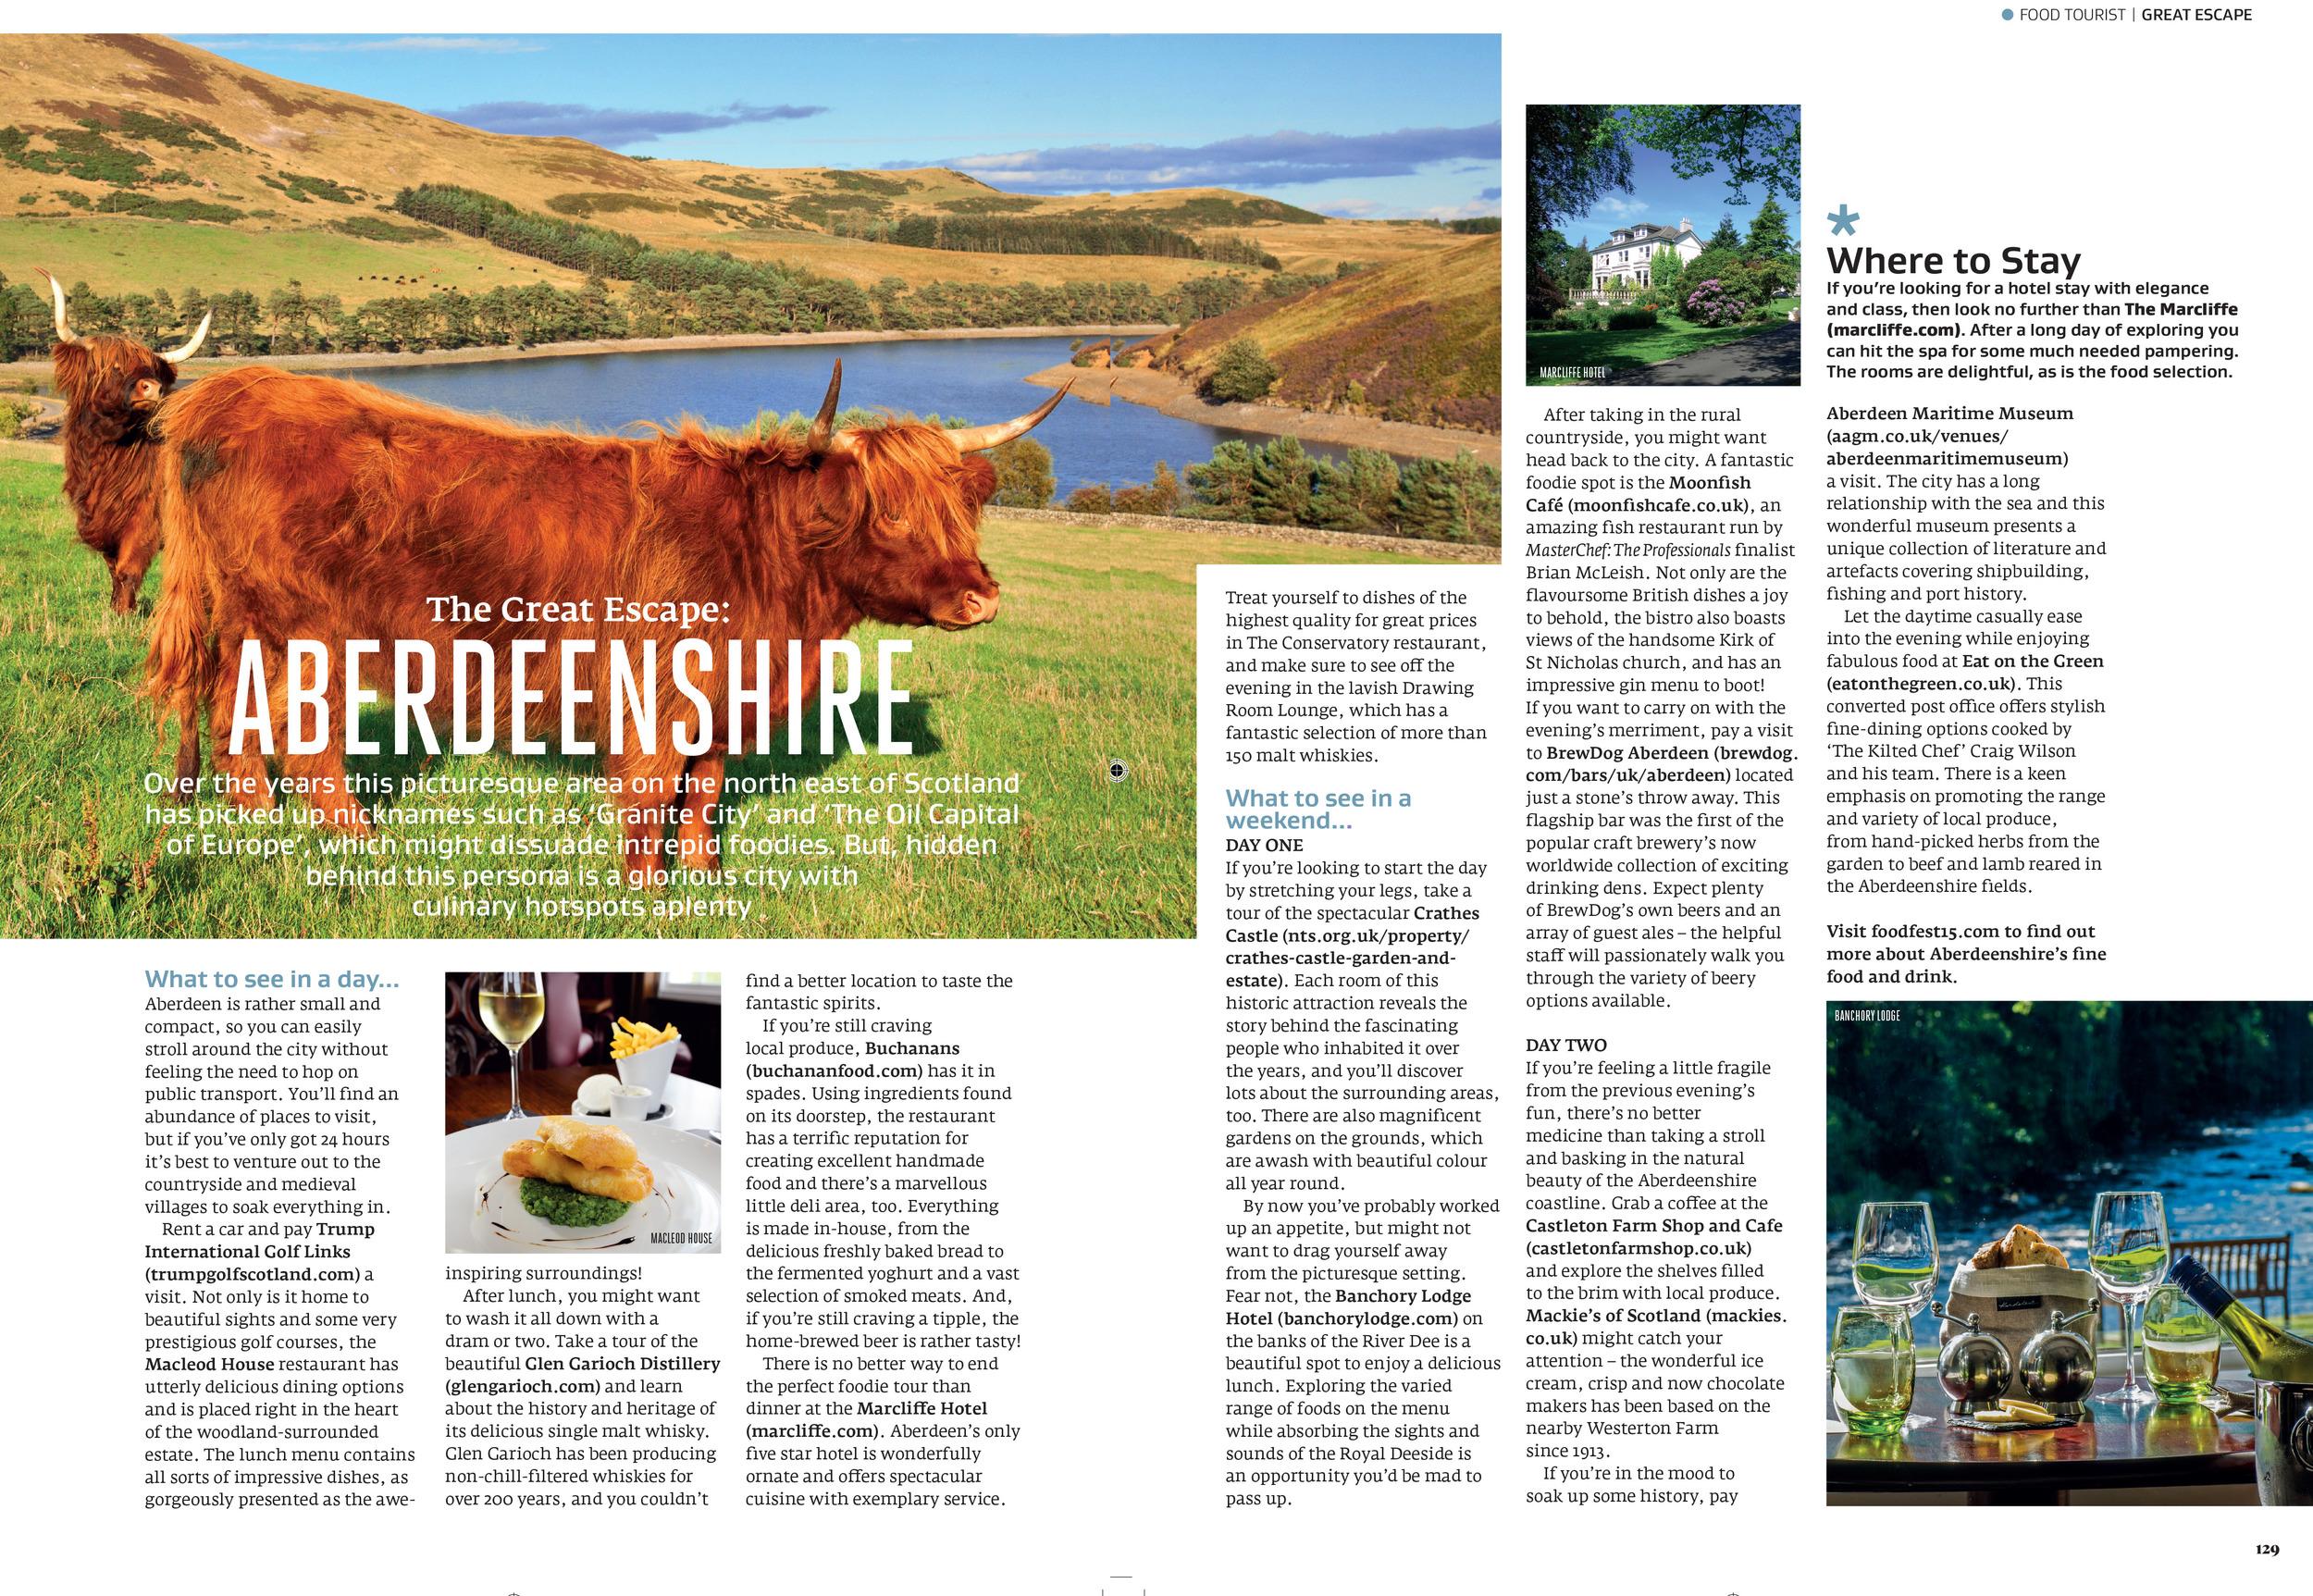 Aberdeen travel feature in Great British Food